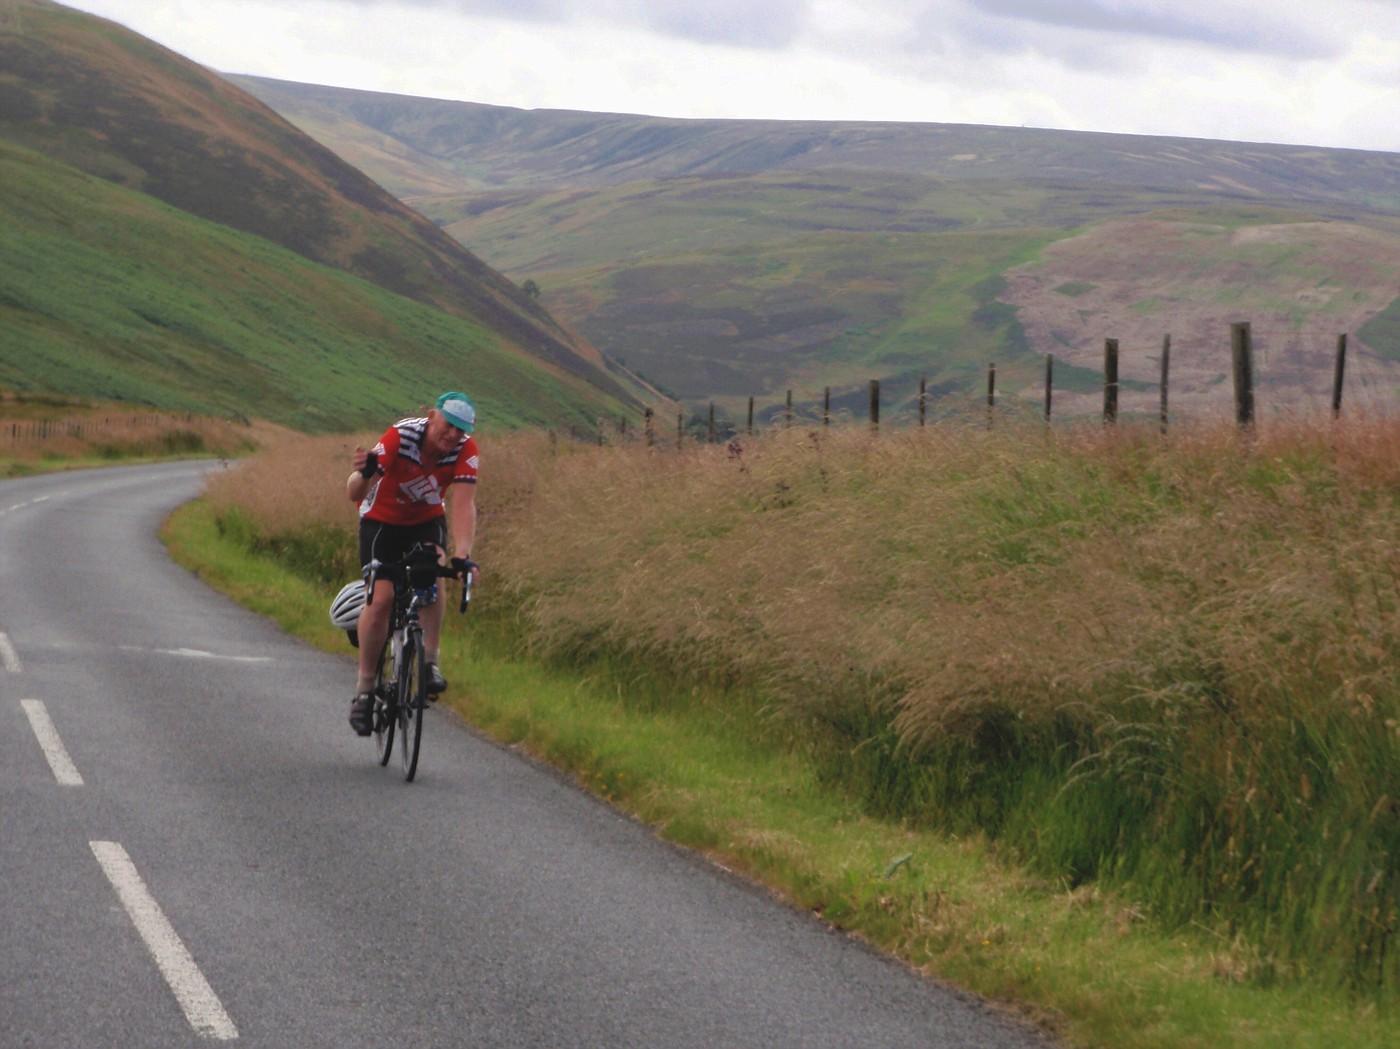 Road through Scottish hills on the way back